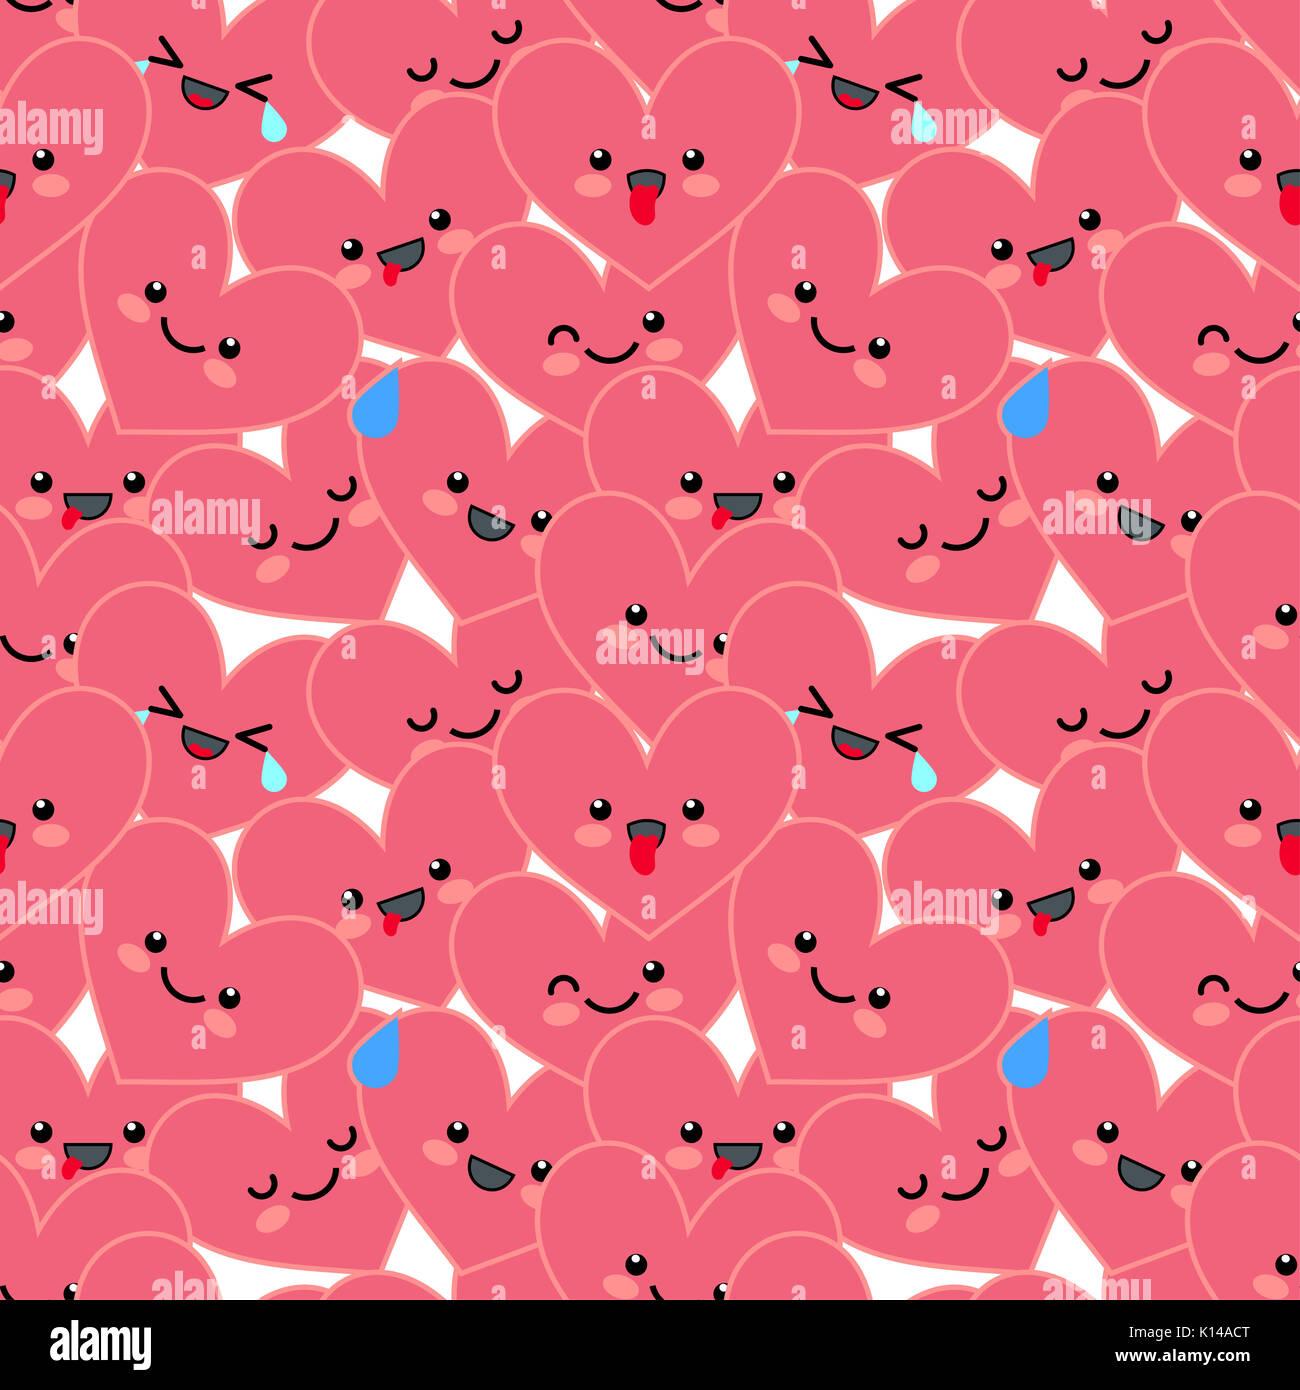 Gracioso Fondo Con Corazones De Color Rosa Trama Perfecta